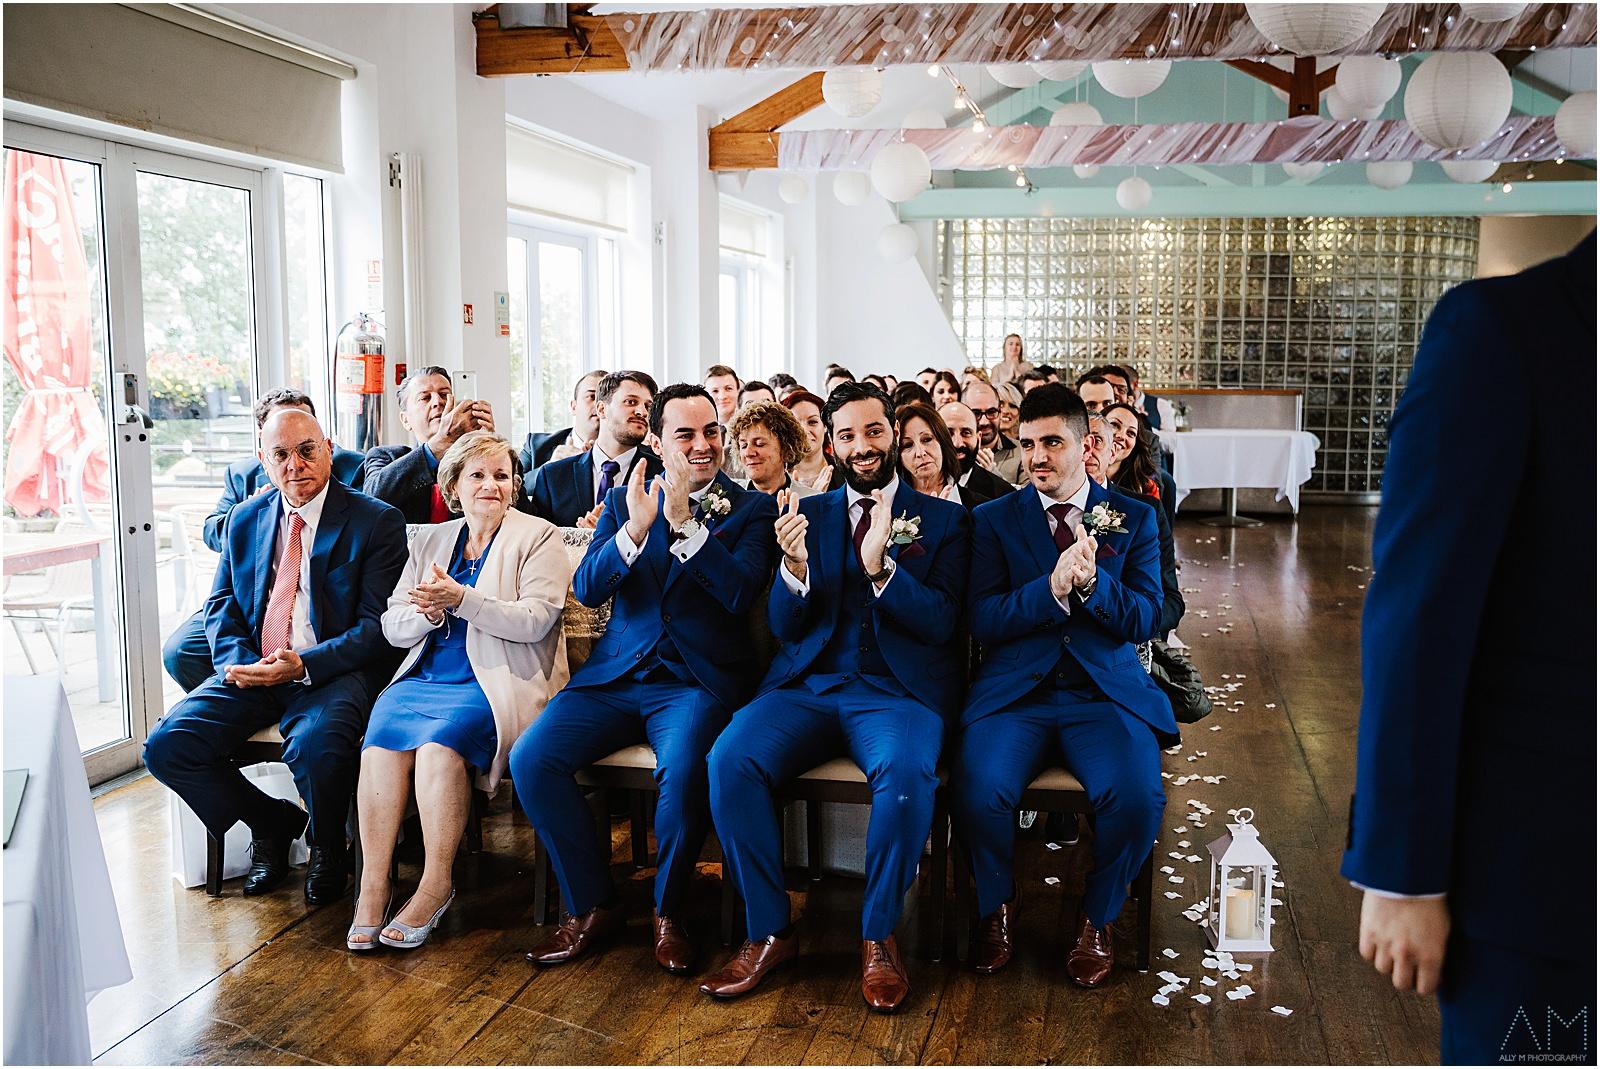 Italian wedding guets clapping